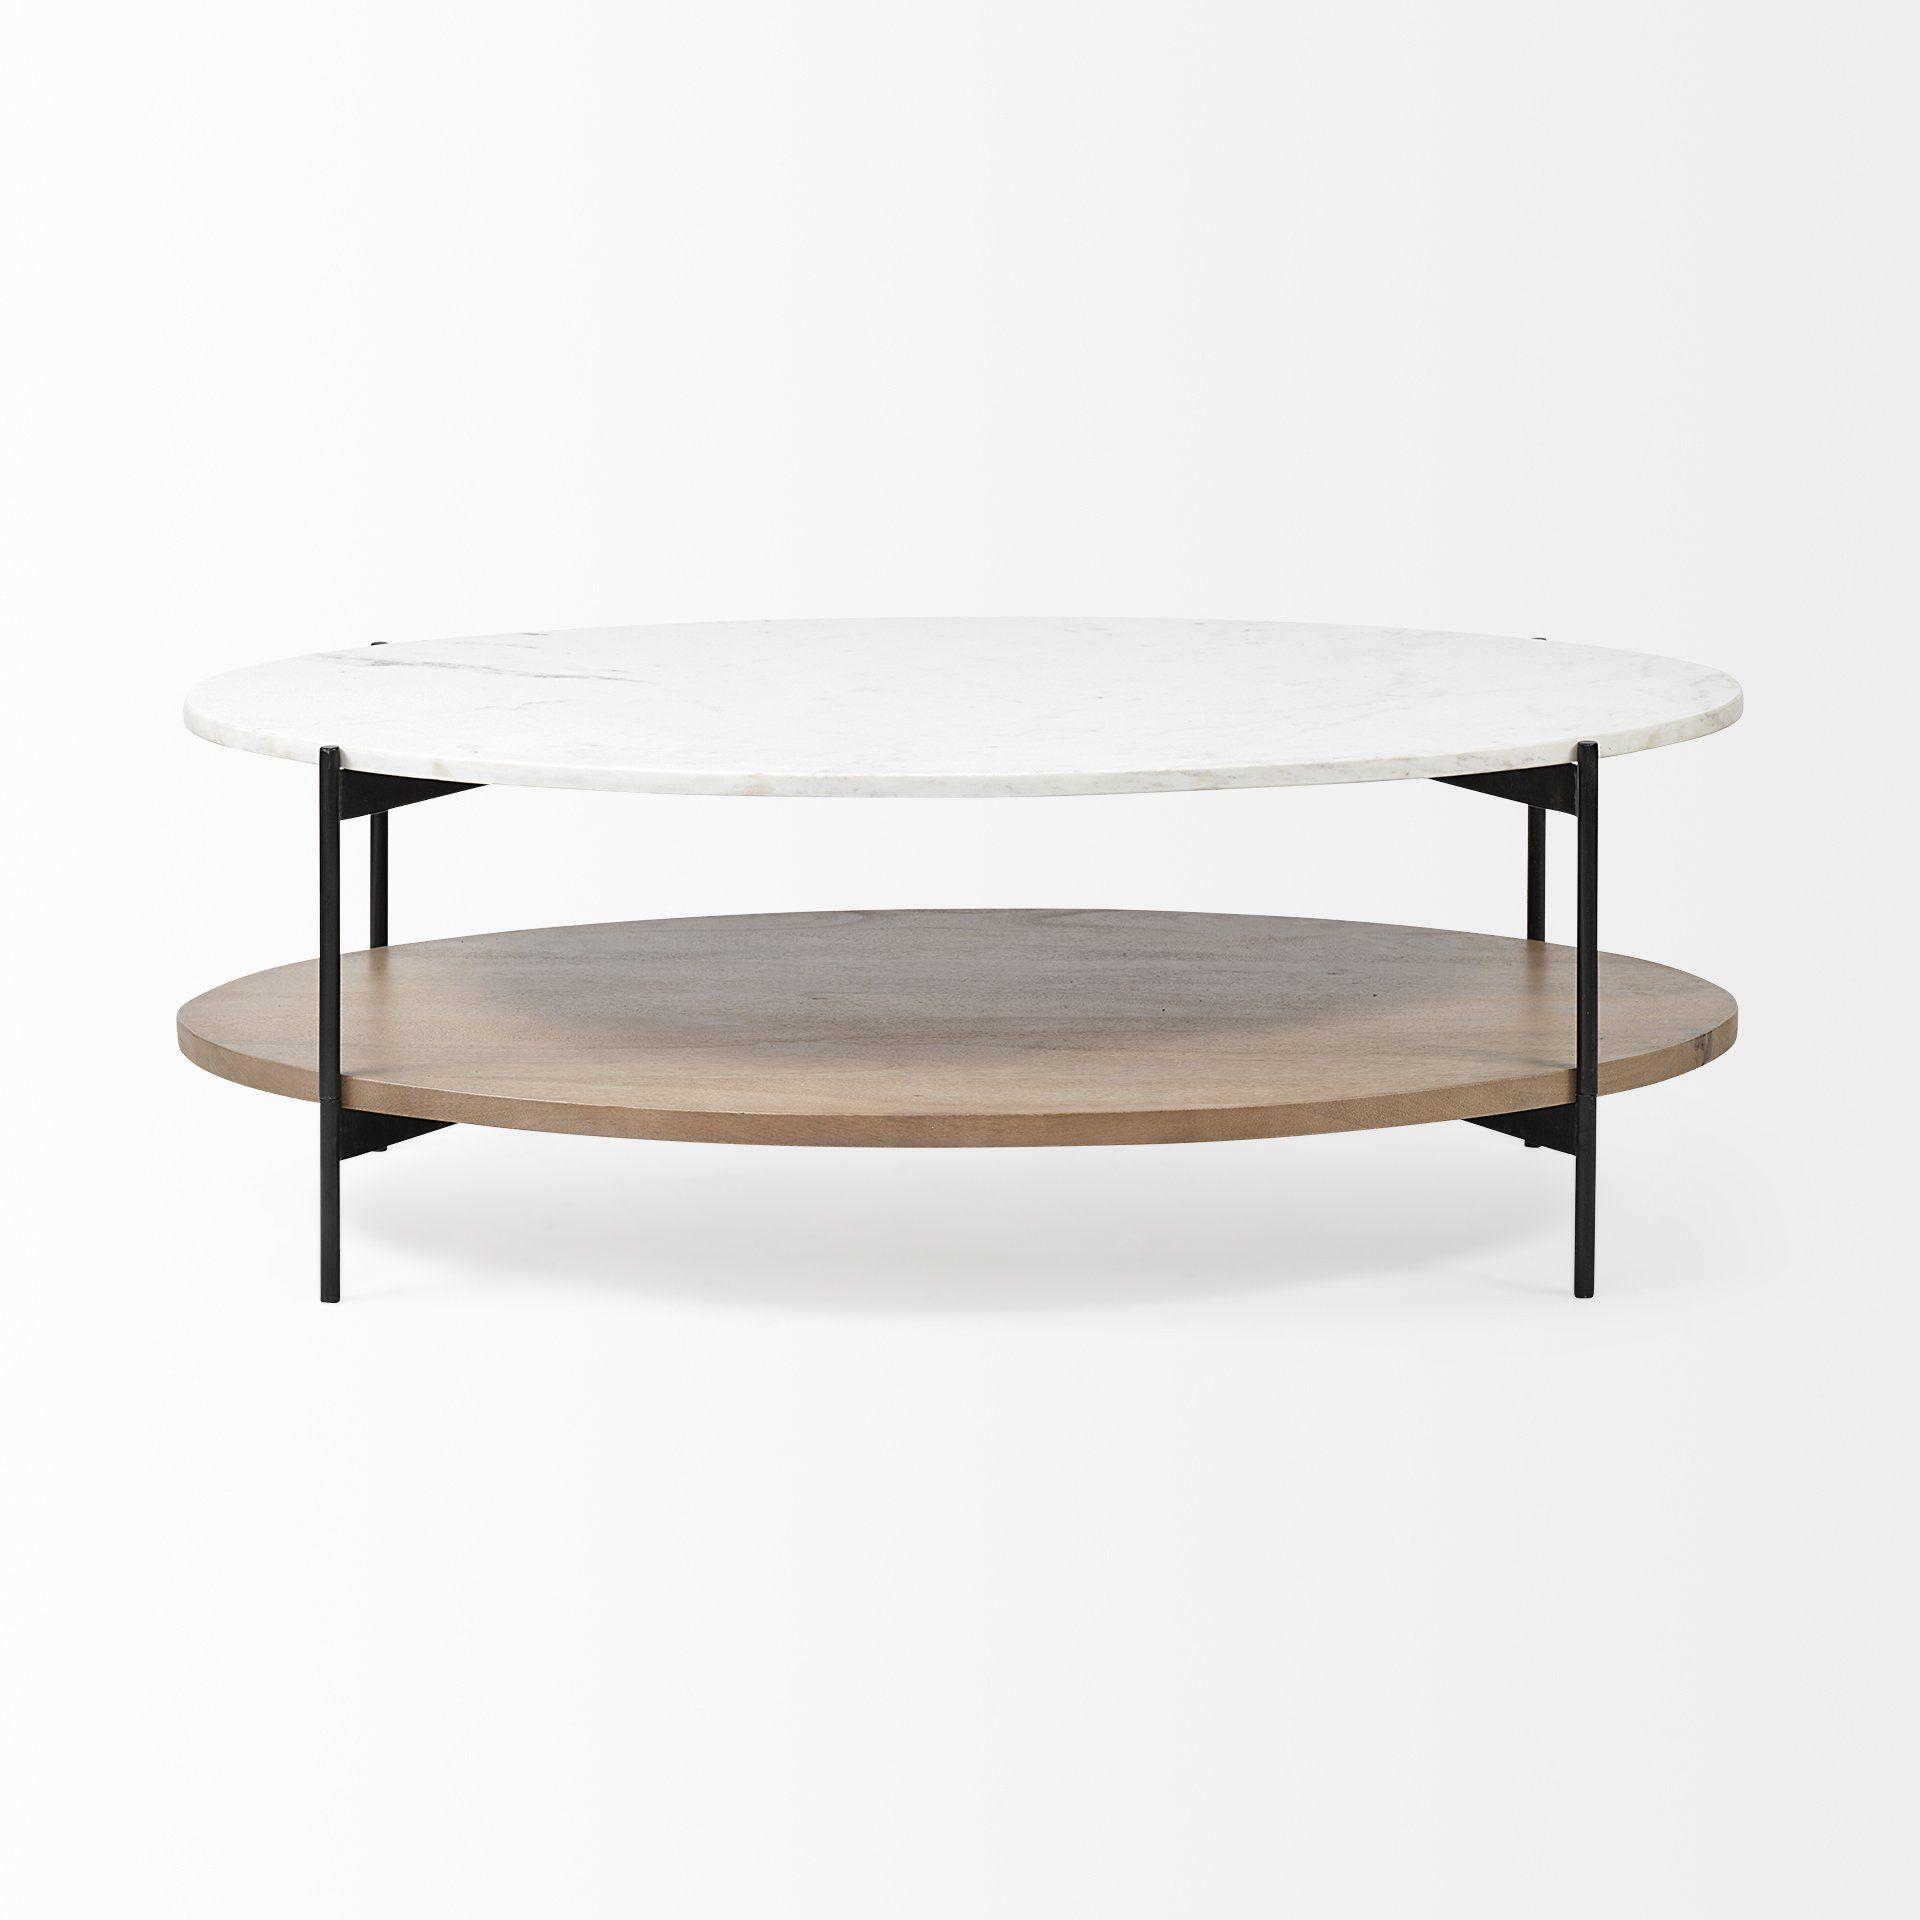 Coffee Table Metal Base Coffee Table Marble Top Coffee Table [ 1920 x 1920 Pixel ]